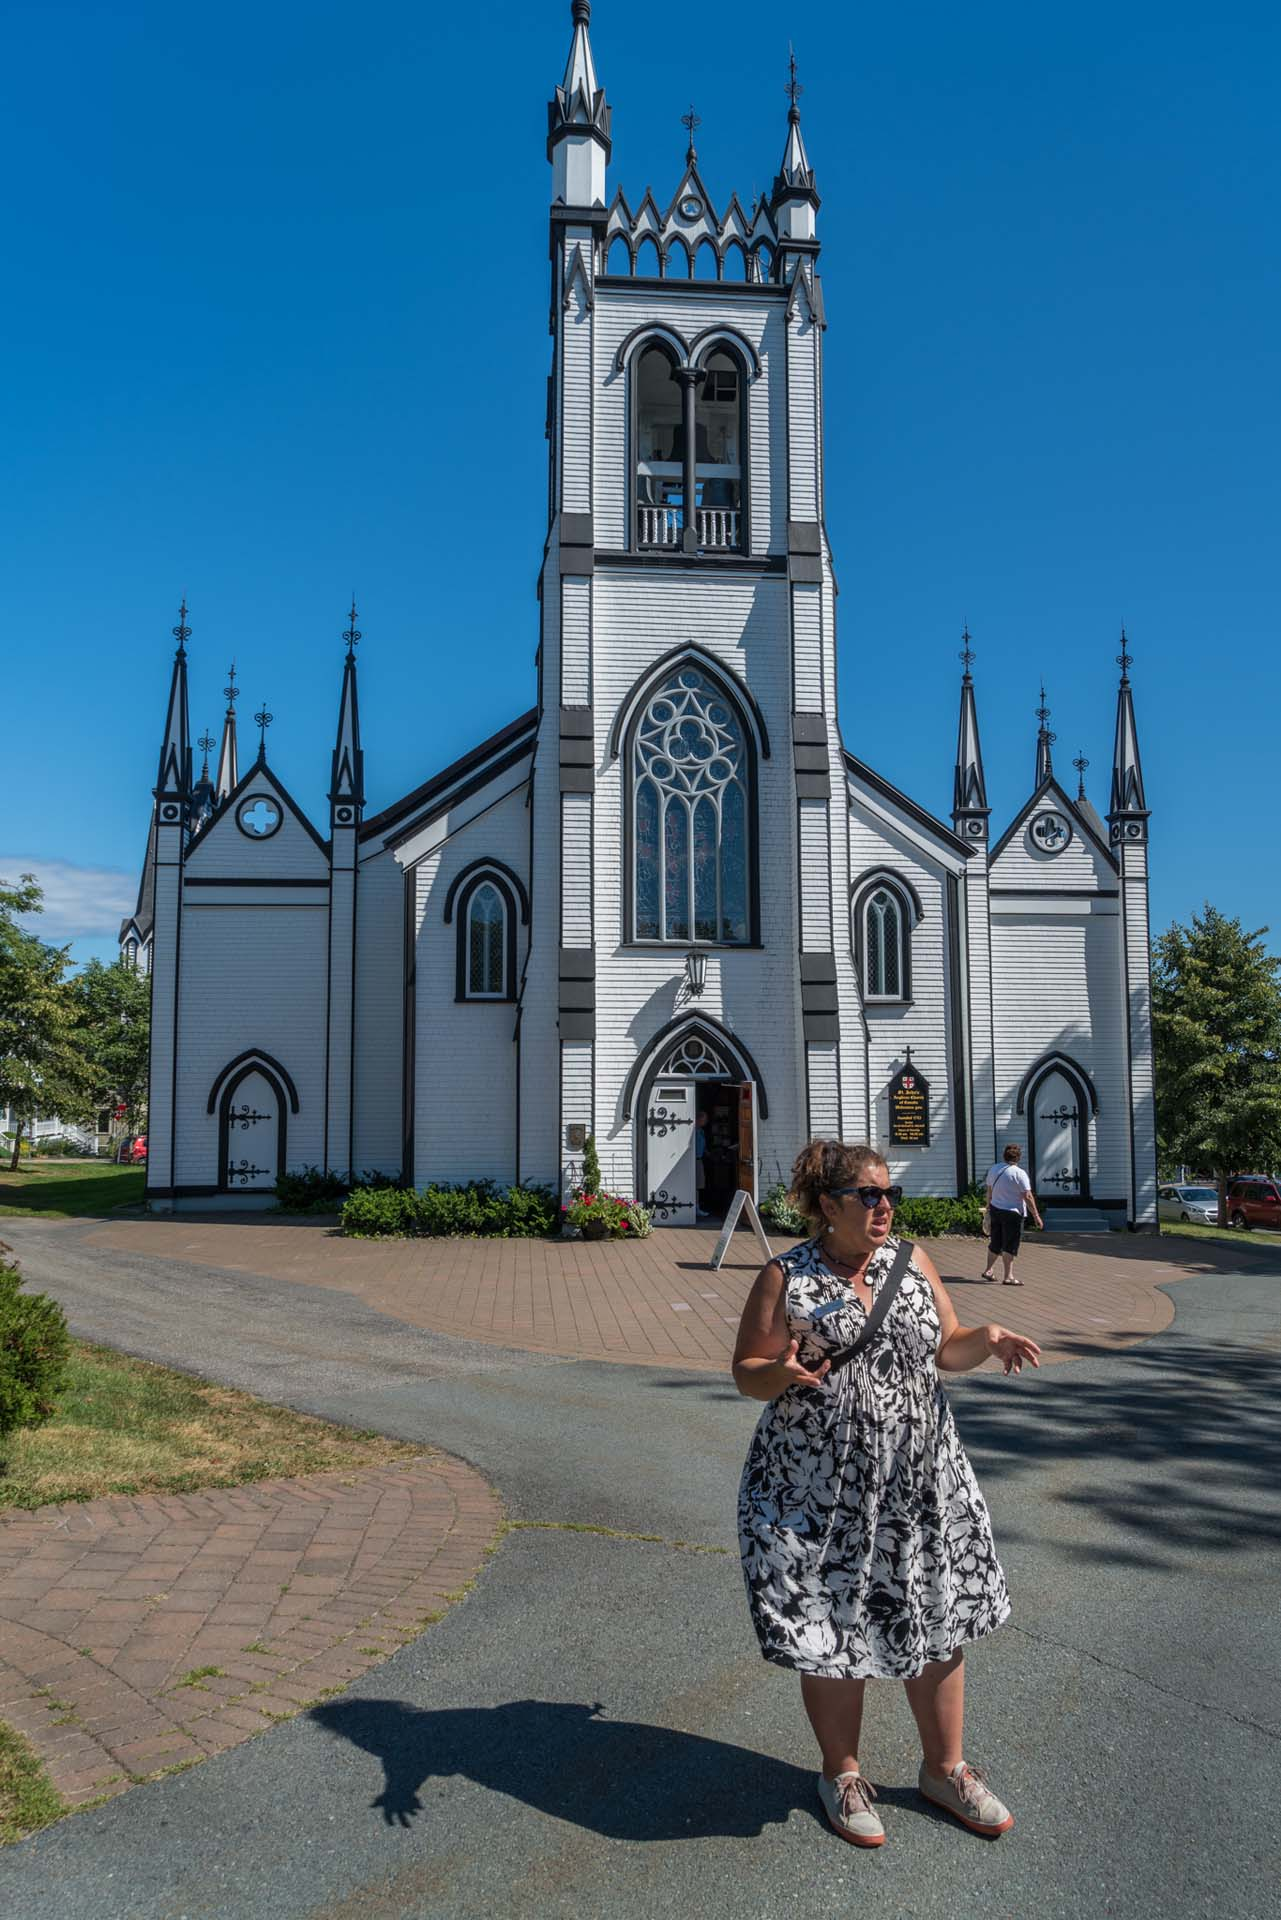 Lunenburg walking tour guide